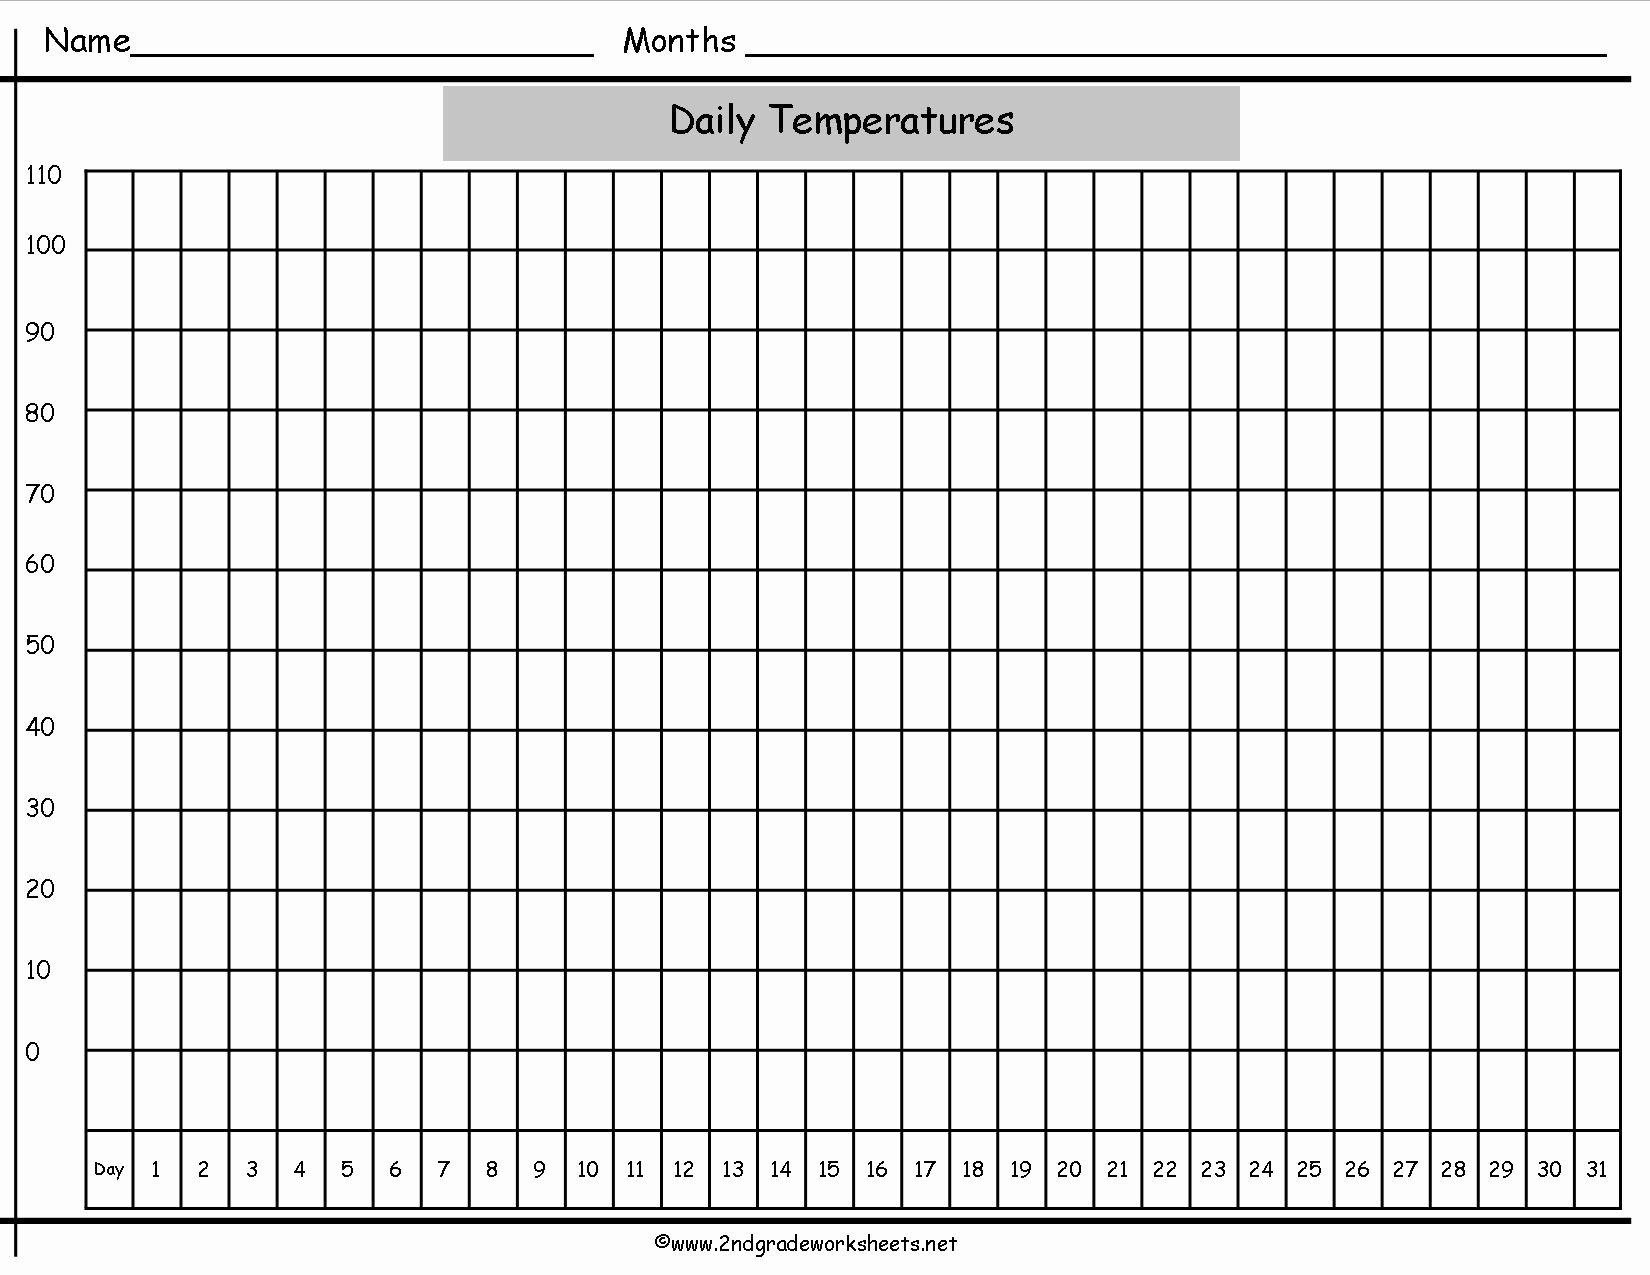 Blank Line Graph Template Inspirational Bar Graph Template to 100